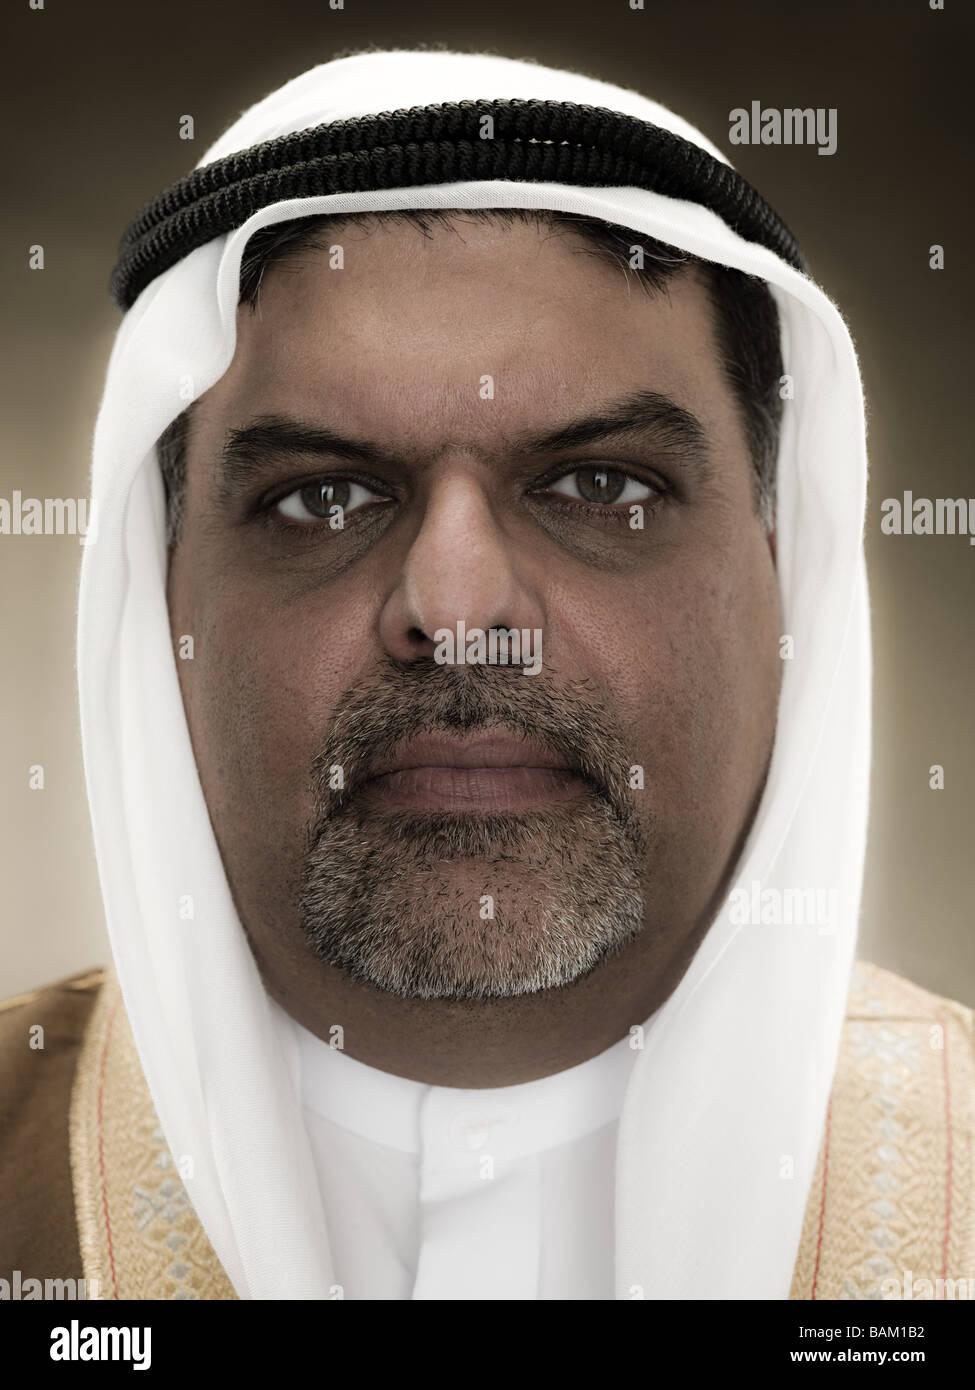 Retrato de un hombre musulmán Imagen De Stock